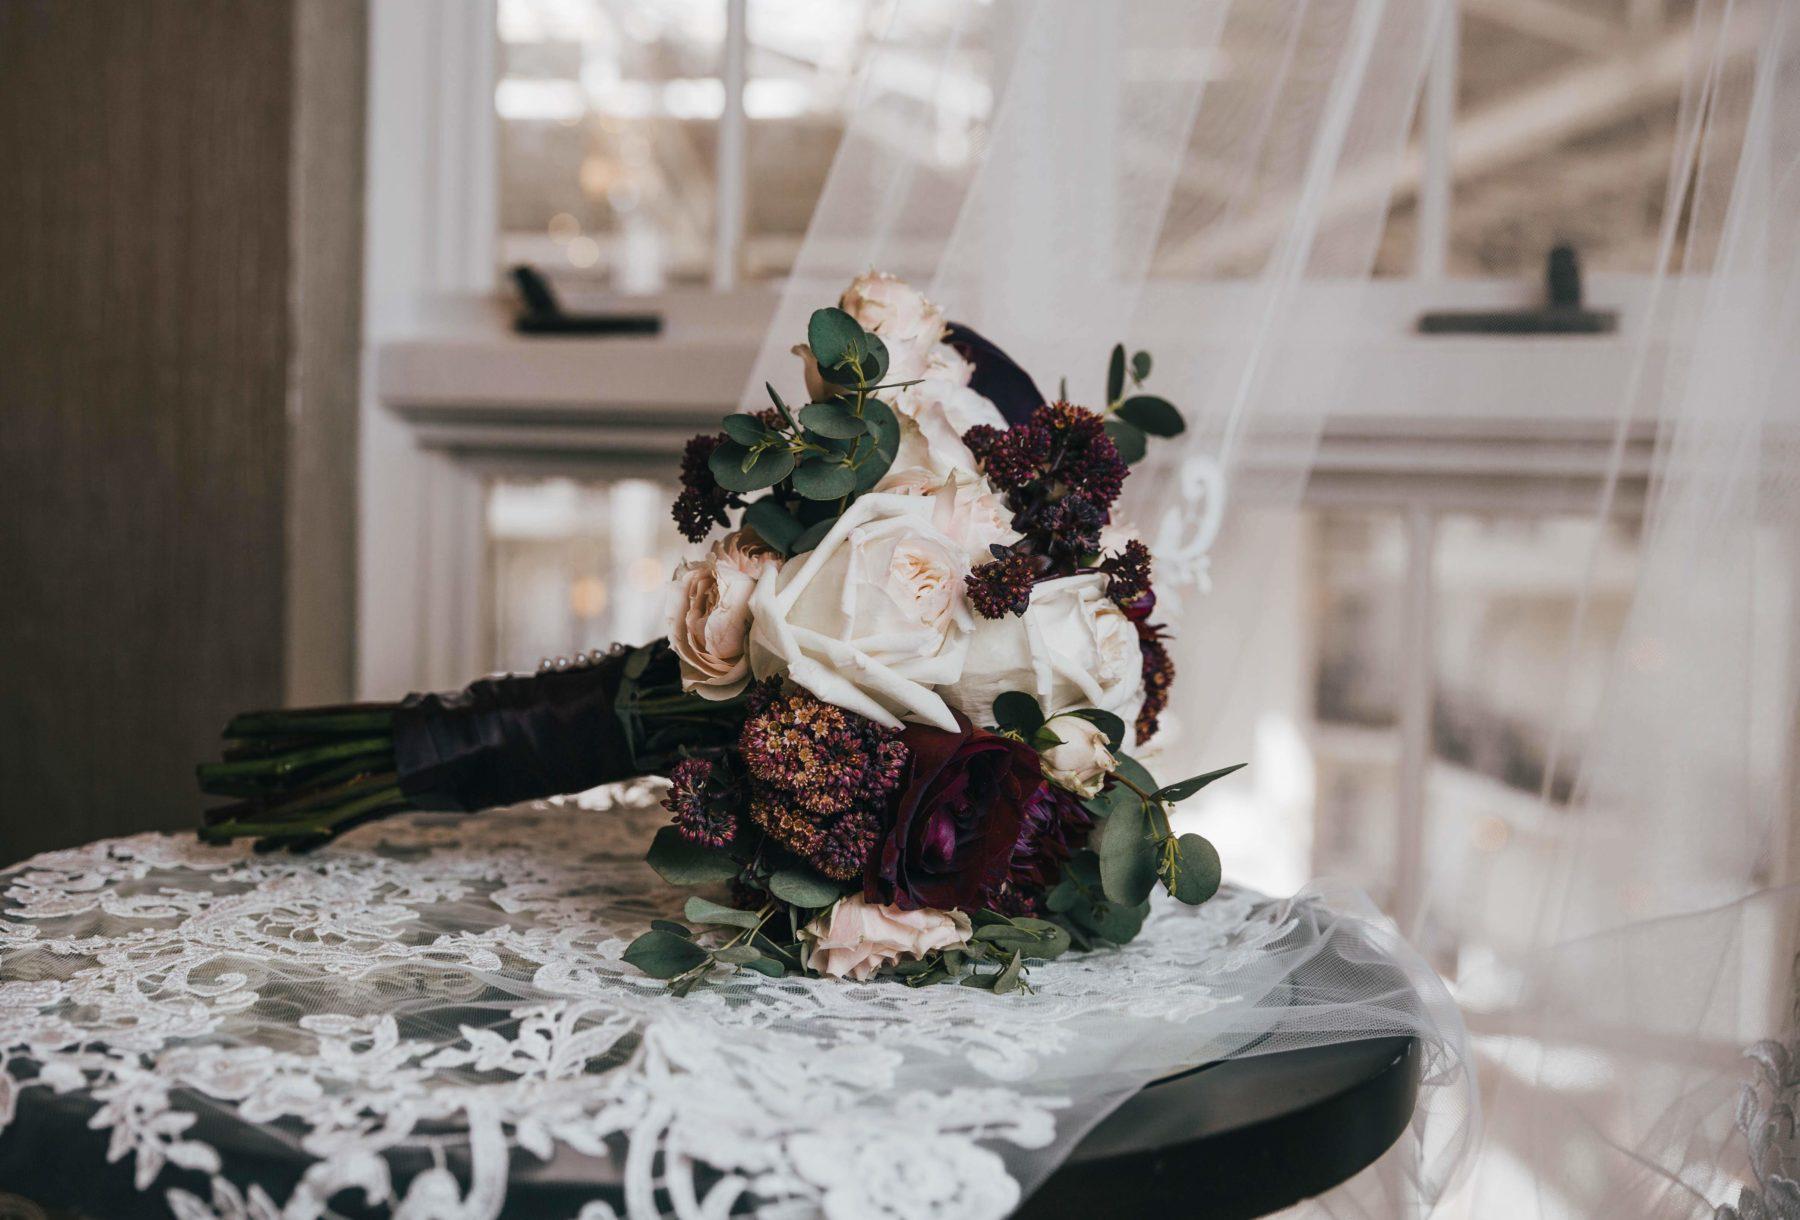 Burgundy and White wedding bouquet design for Opryland Wedding